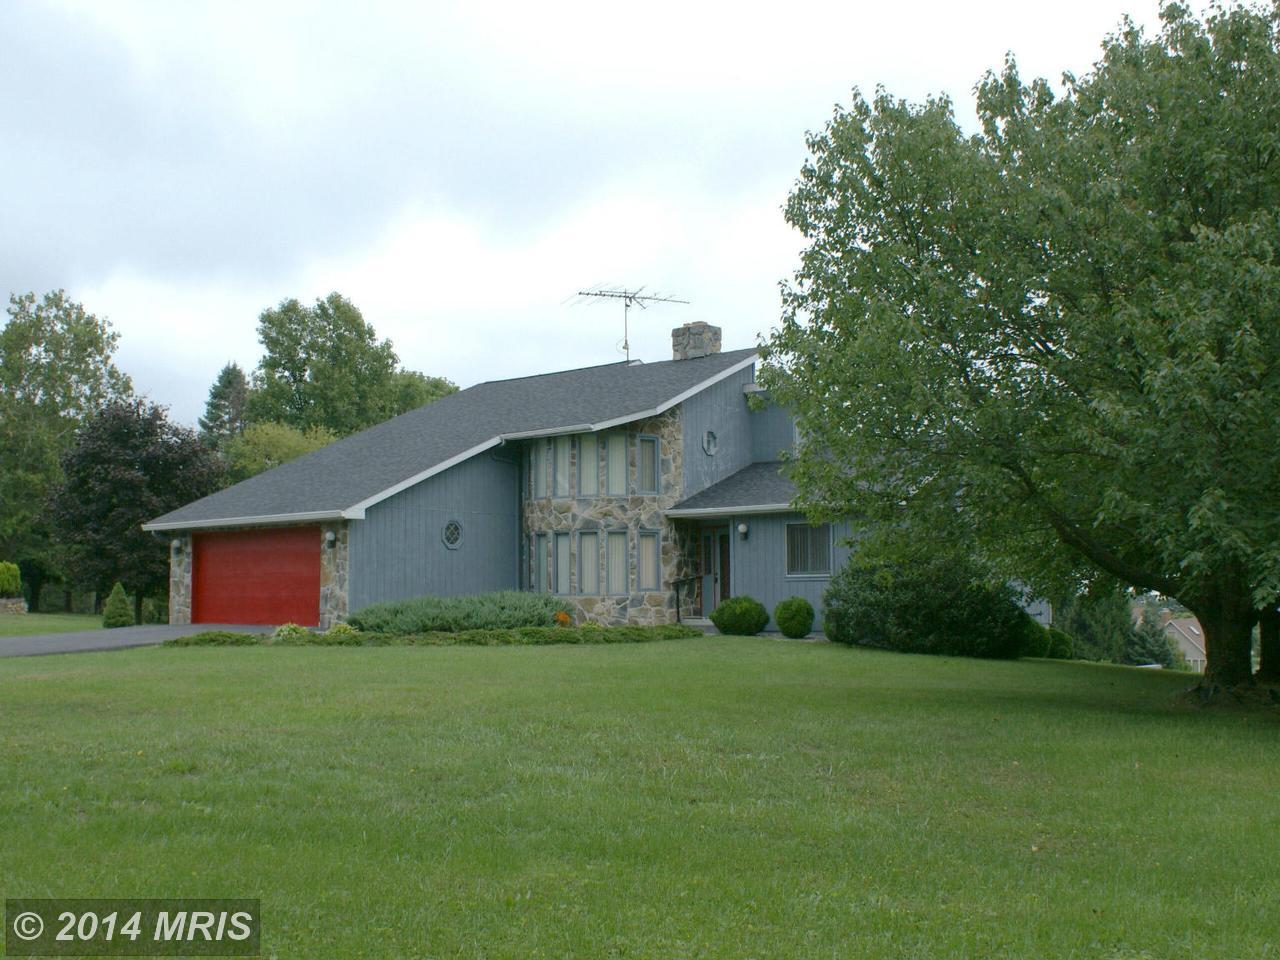 residential properties for sale in biglerville pa biglerville mls biglerville real estate